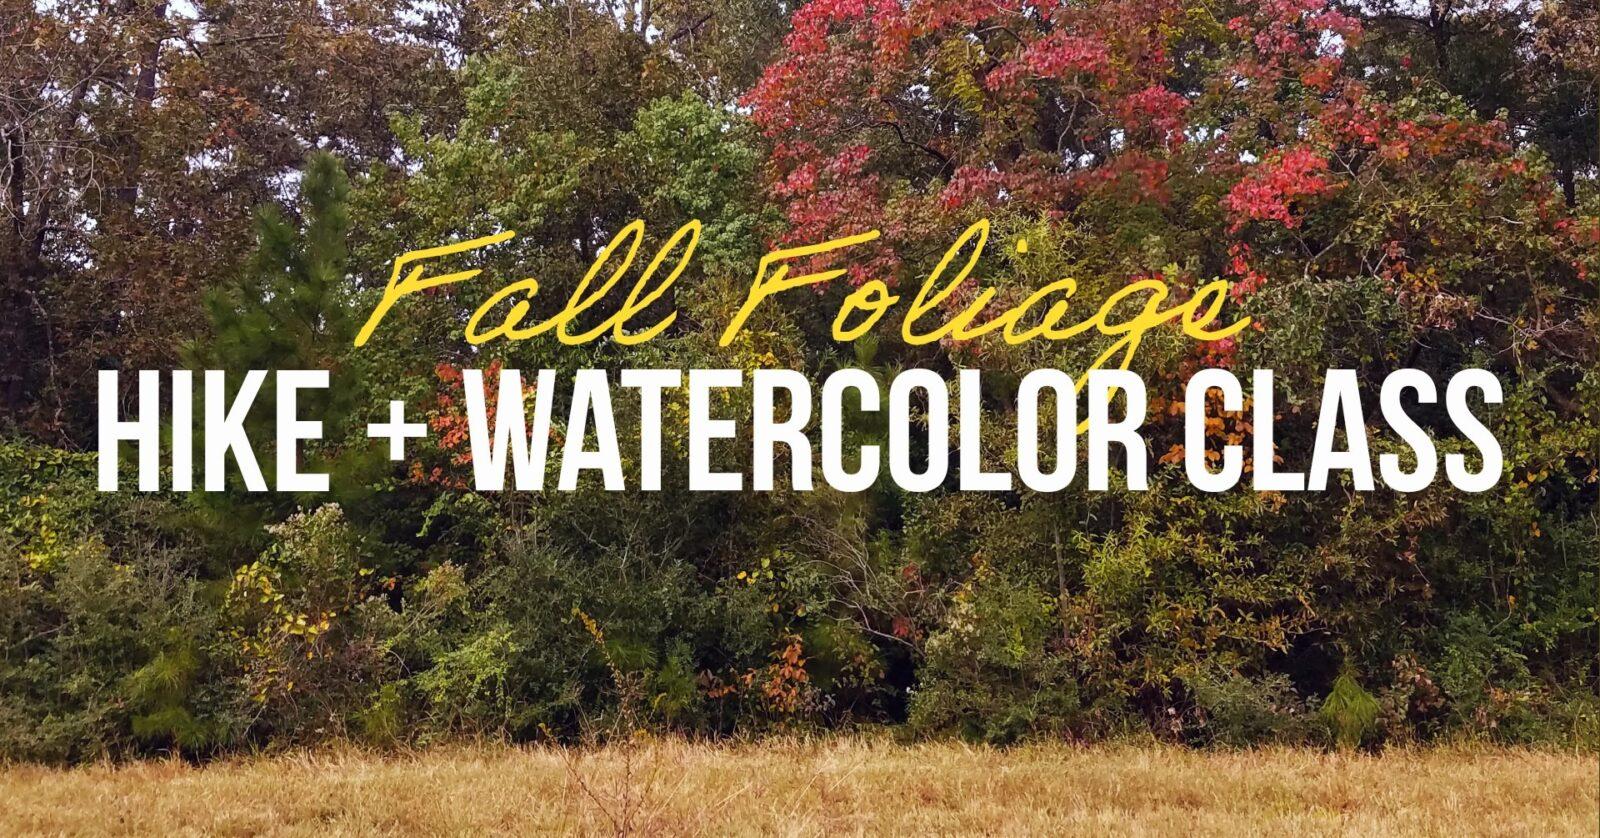 Hike and Watercolor Class at Menil Park